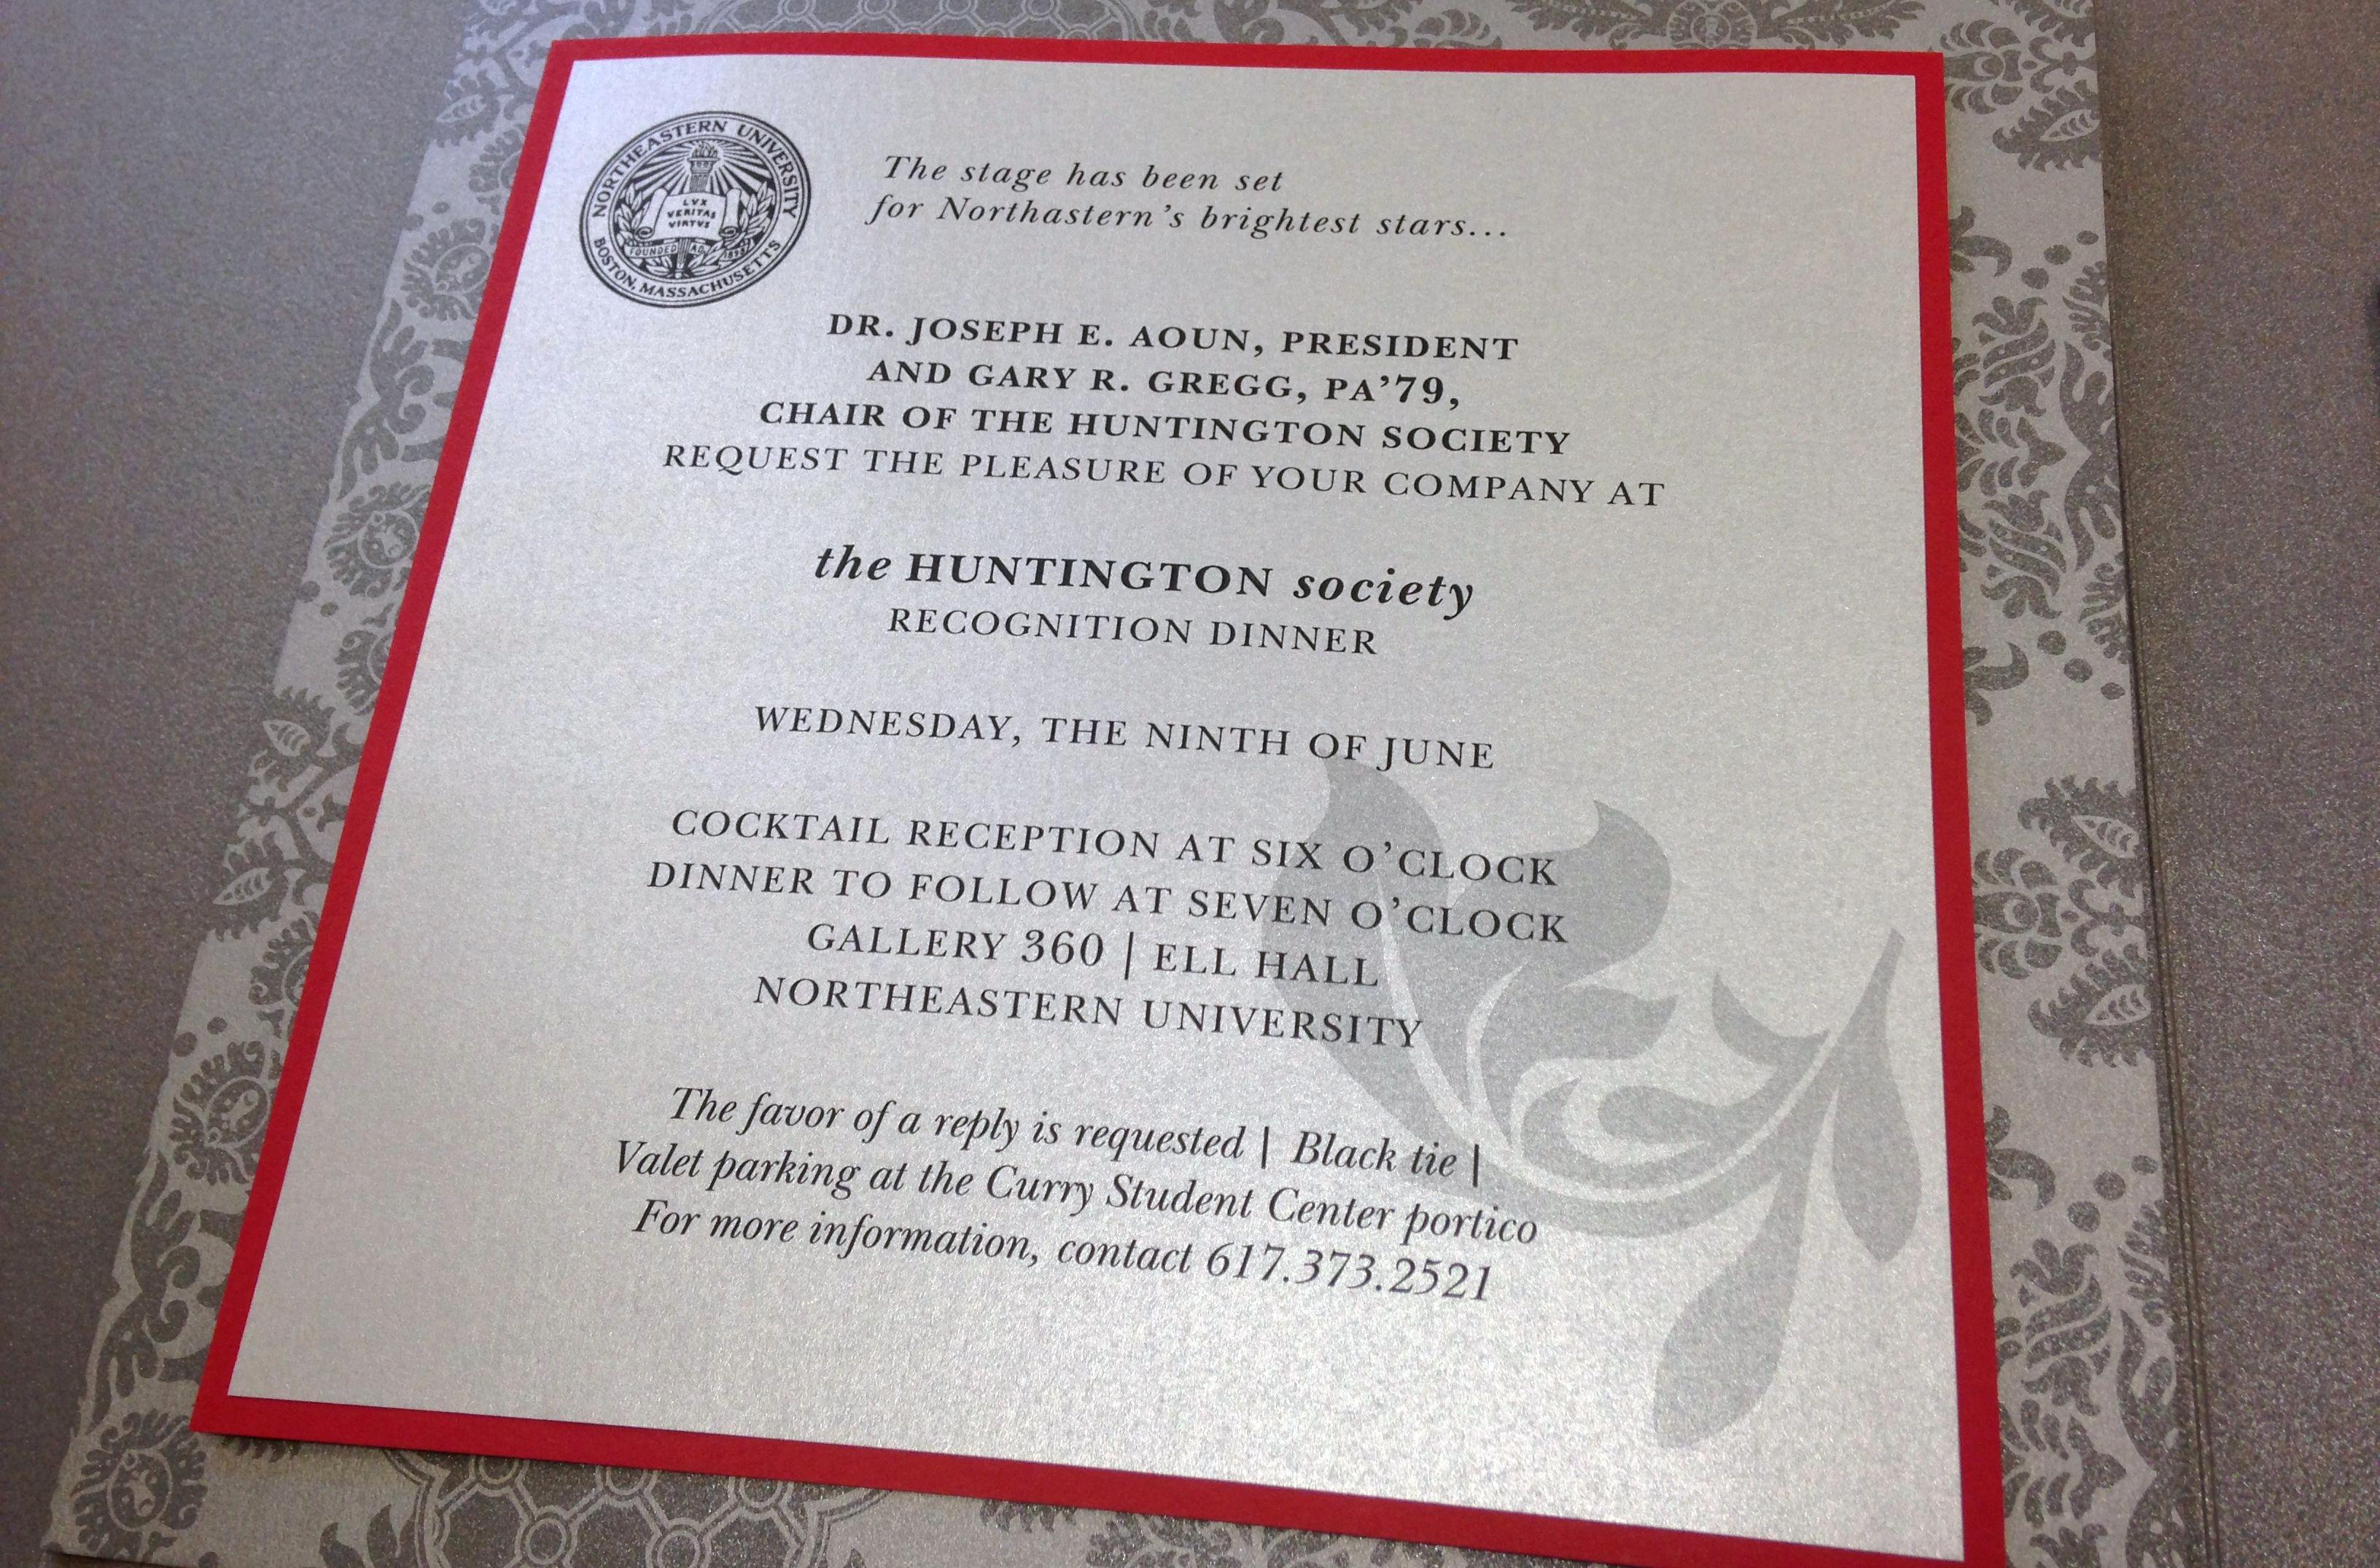 Donor Appreciation event Invitation Best Of Huntington society Recognition Dinner Invitation